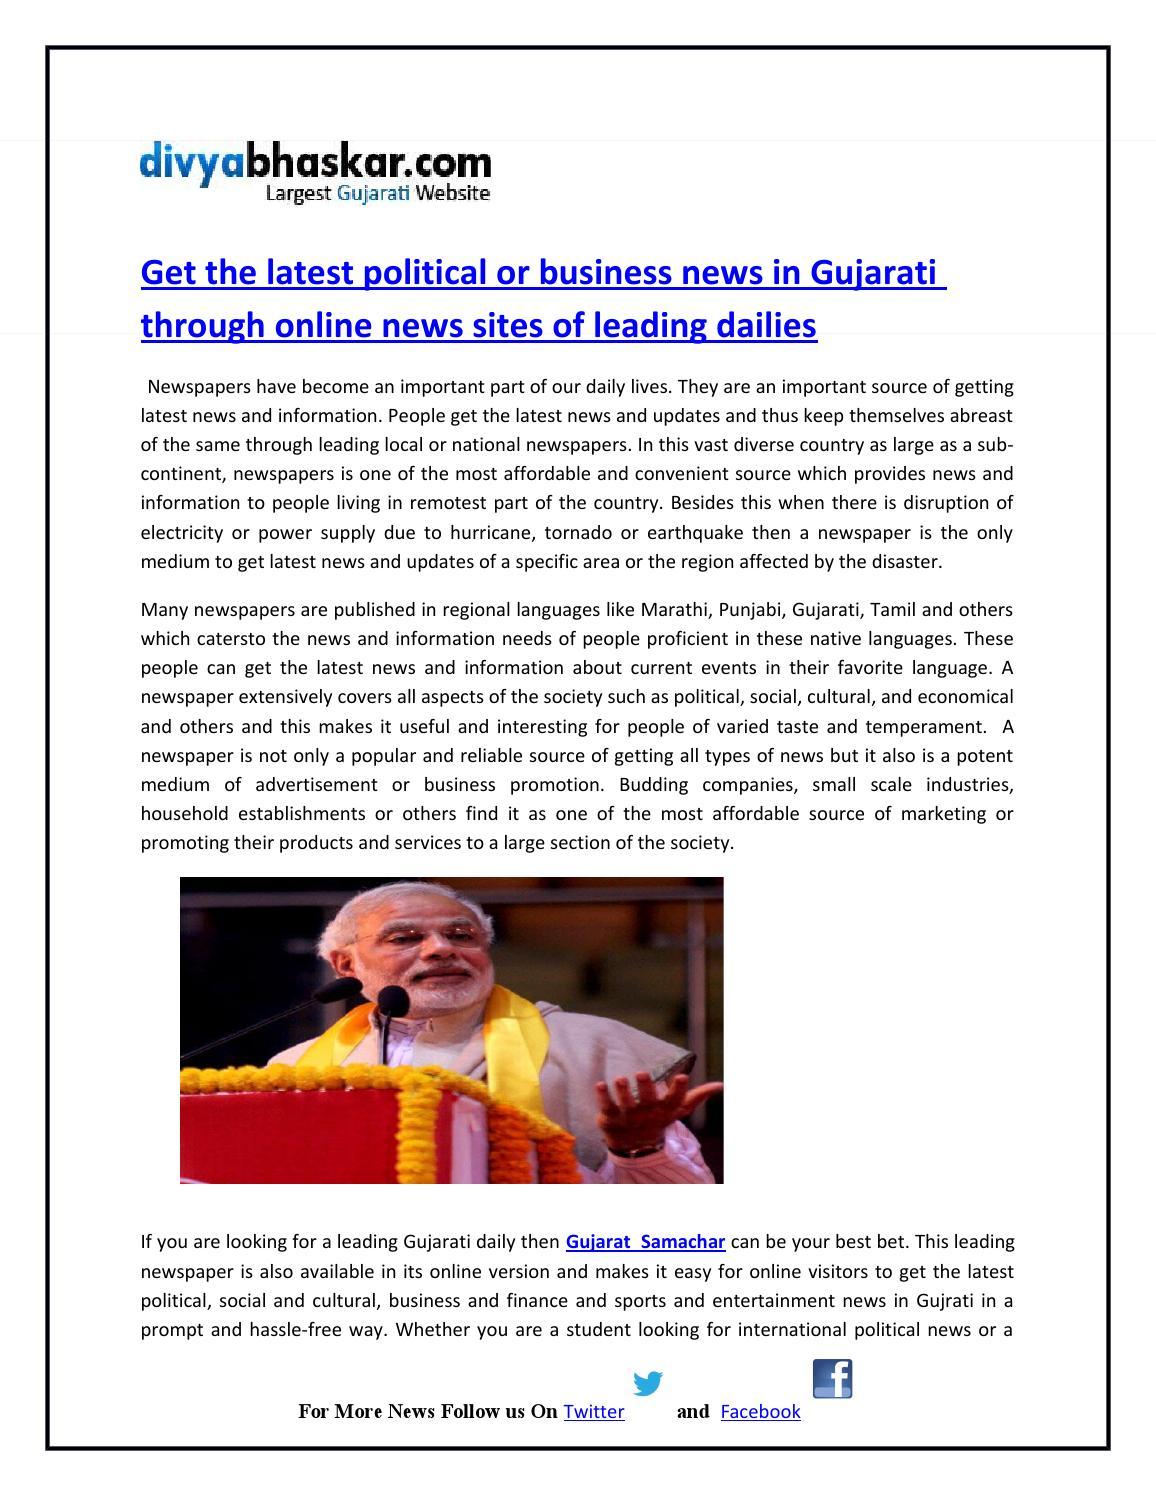 divyabhaskar e paper E-paper e-paper sandesh tv-live 16m 1m 17m apps rbiના પૂર્વ ગવર્નર રઘુરામ રાજનનો ધડાકો : upa .